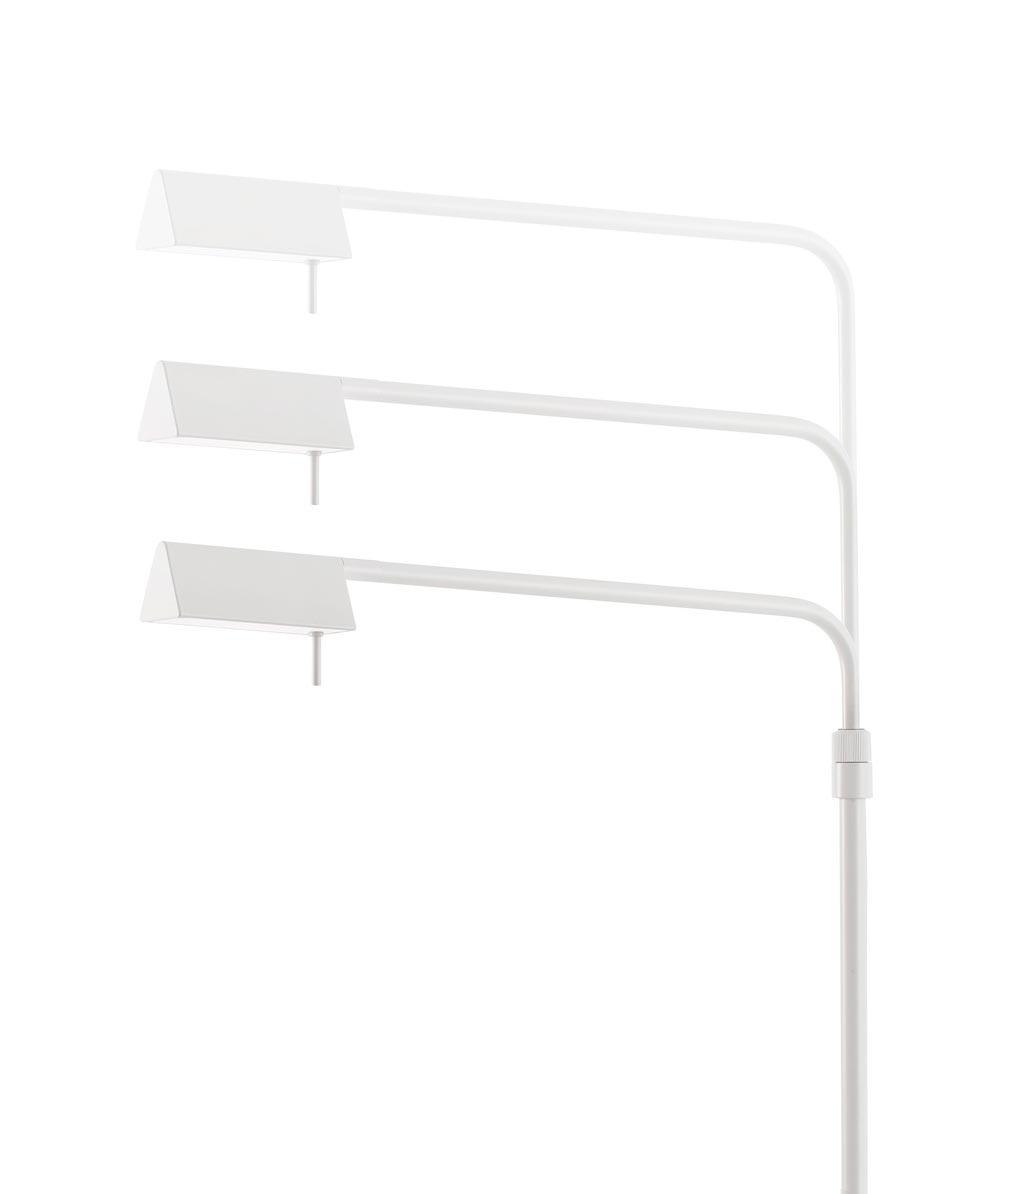 Lámpara de pie regulable blanca ACADEMY LED detalle